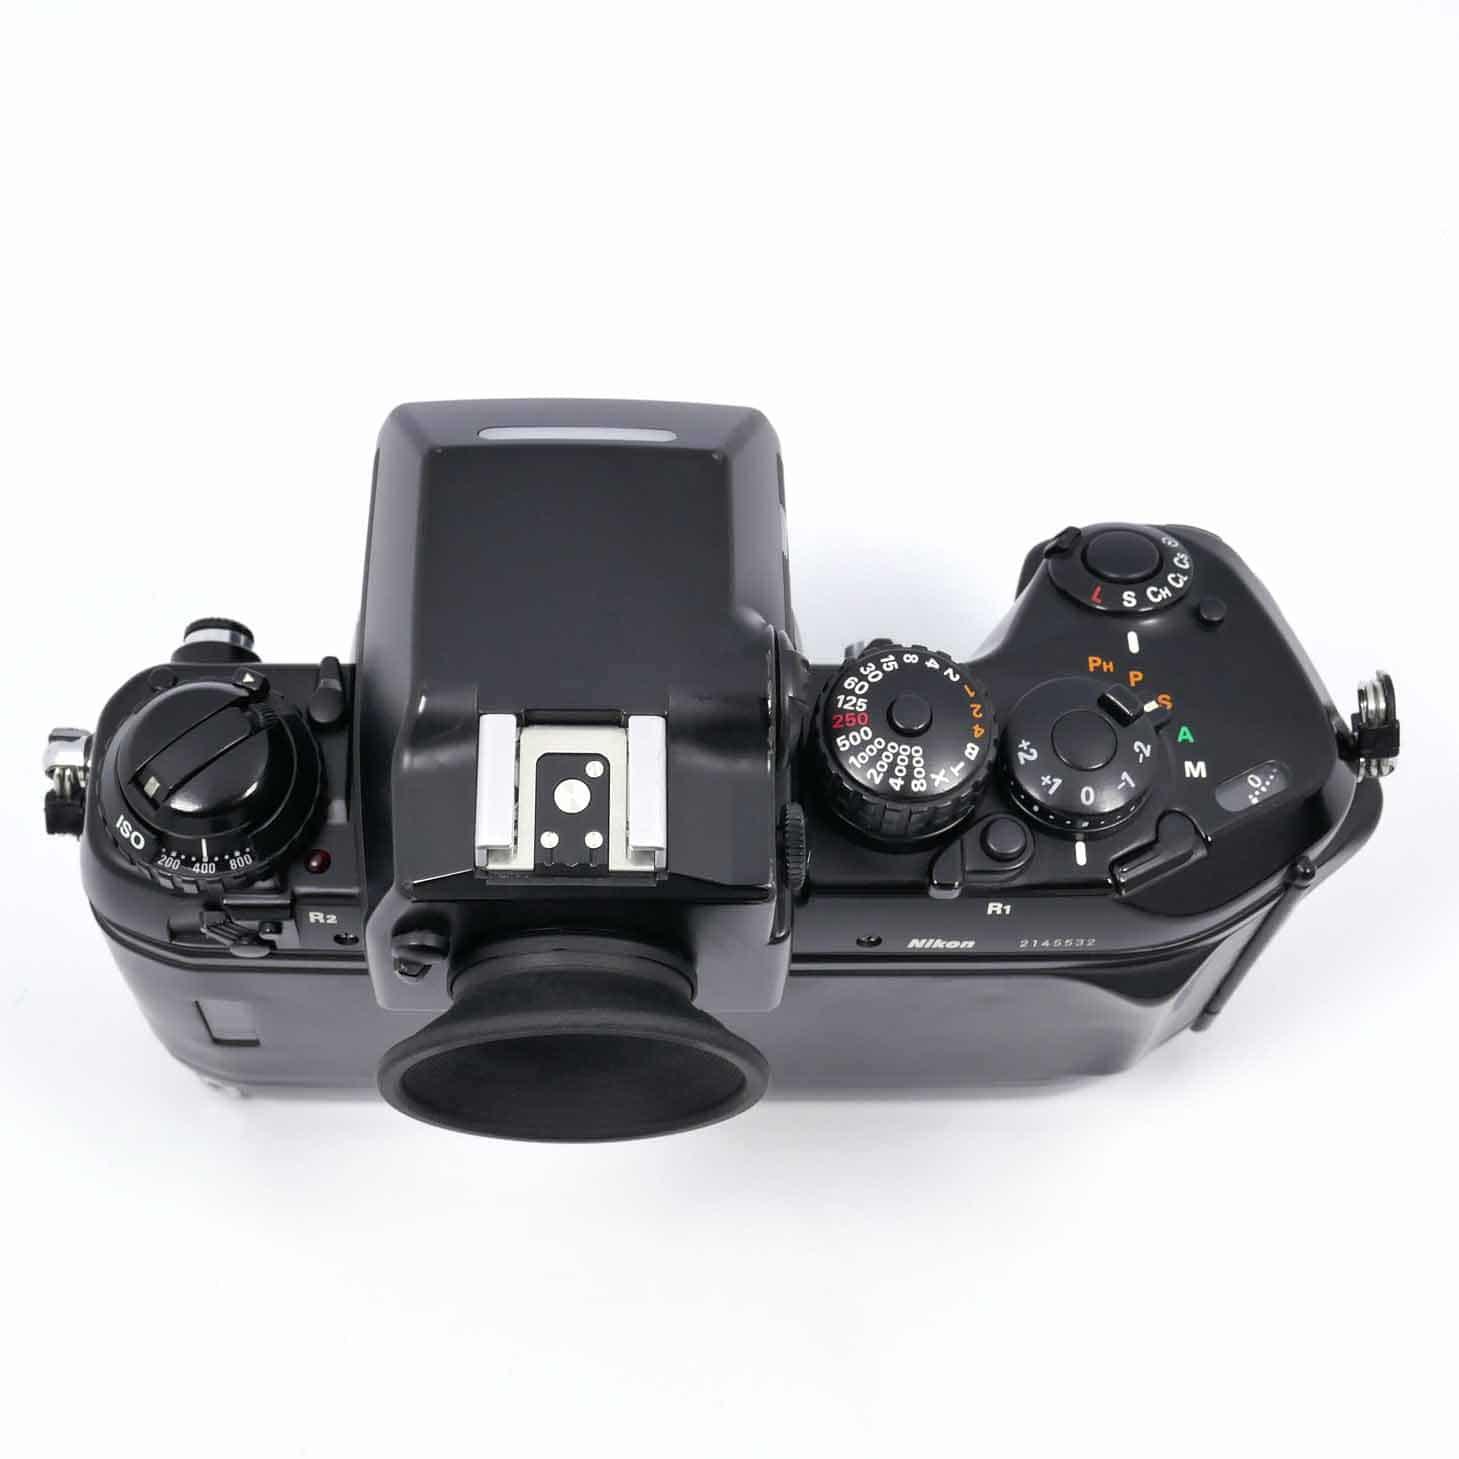 clean-cameras-Nikon-F4-+Nikon--MB-21-01